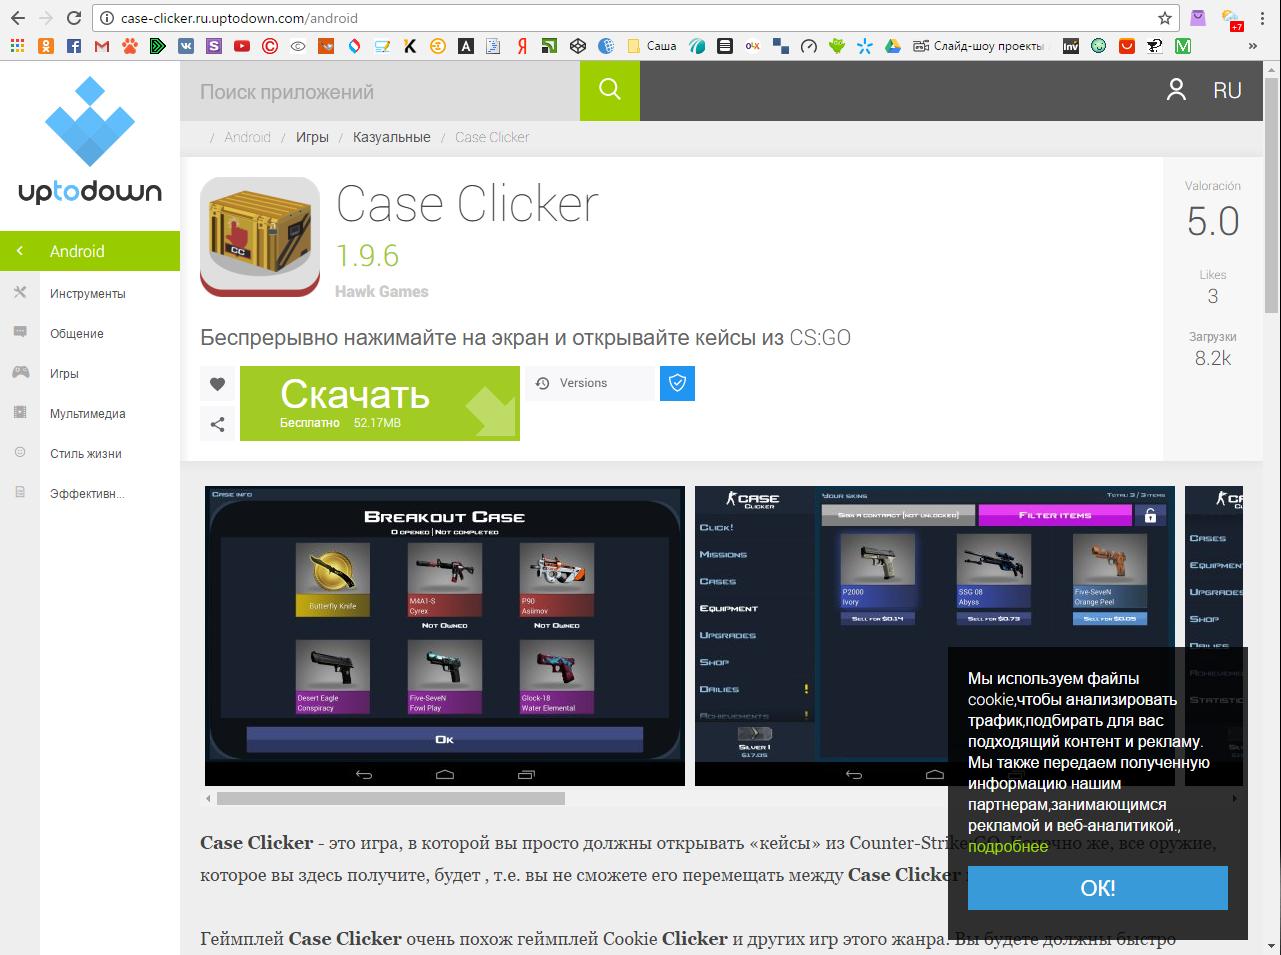 case-clicker-sajt-igry